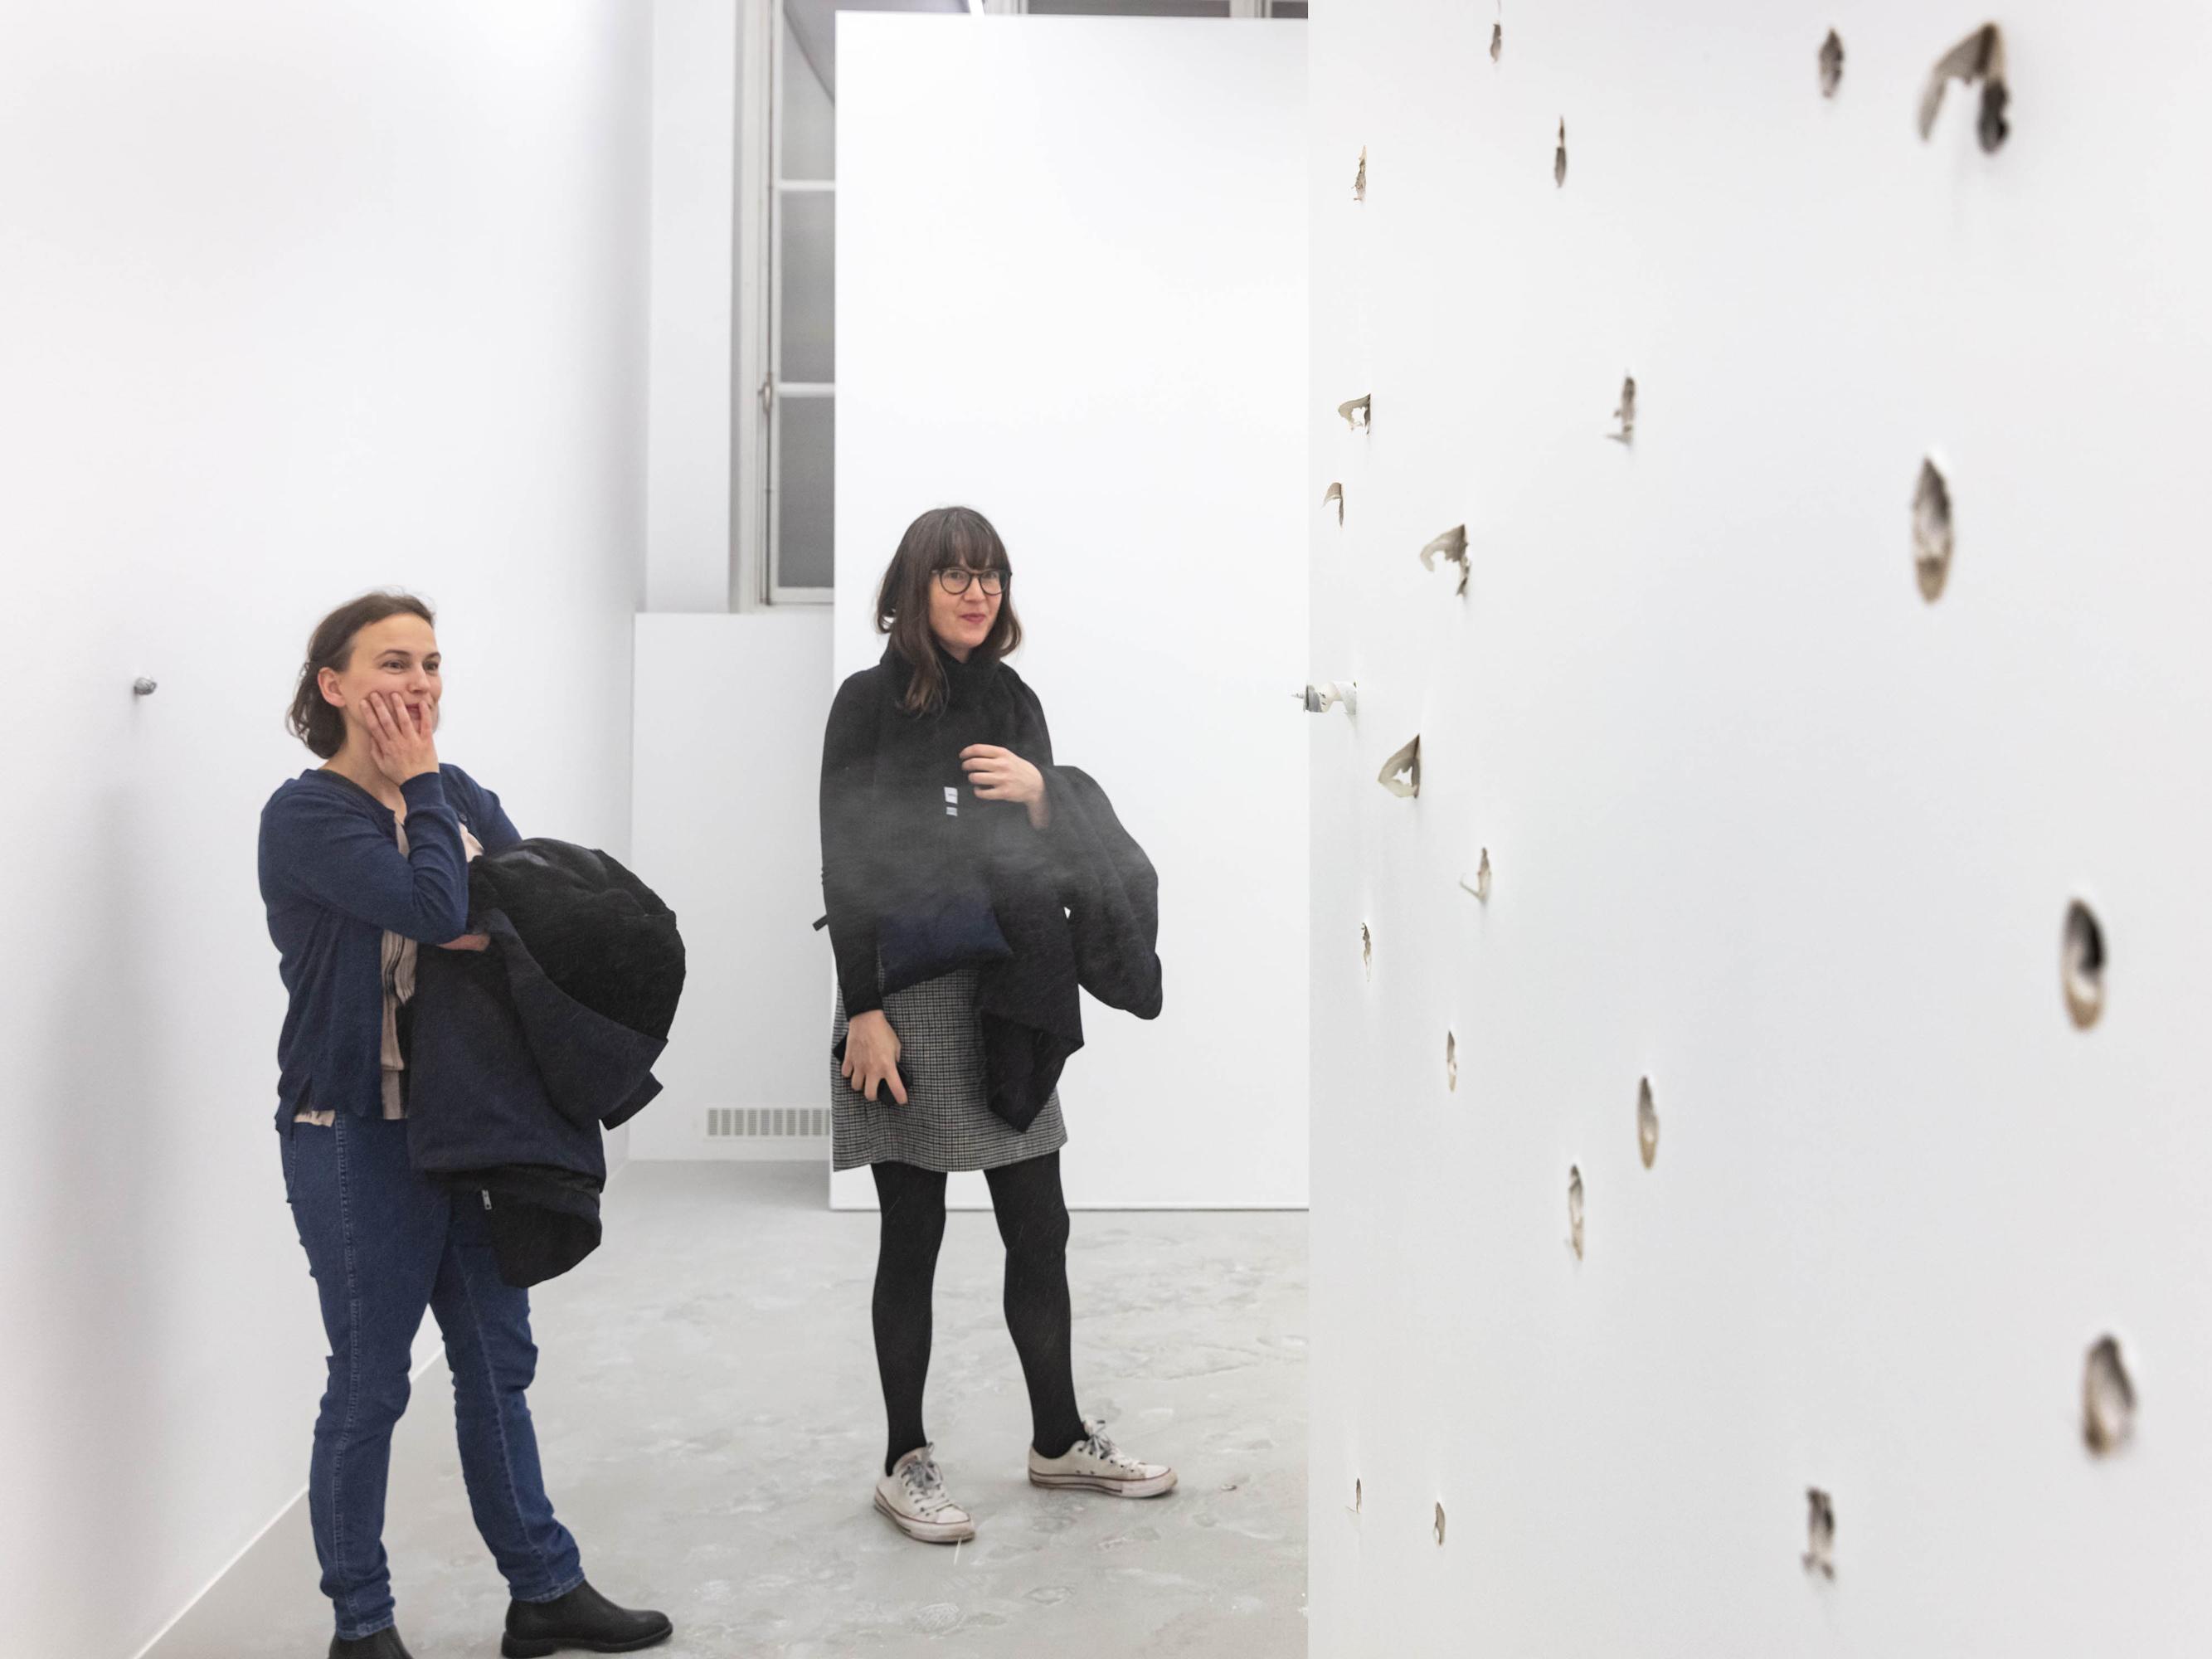 You Take My Breath Away, 2020, White cube, fan, 270 x 270 x 270 cm. Installation view and performance, Kristina Matousch, You Take My Breath Away, 2020, Cecilia Hillström Gallery. Photo: Jean-Baptiste Béranger.